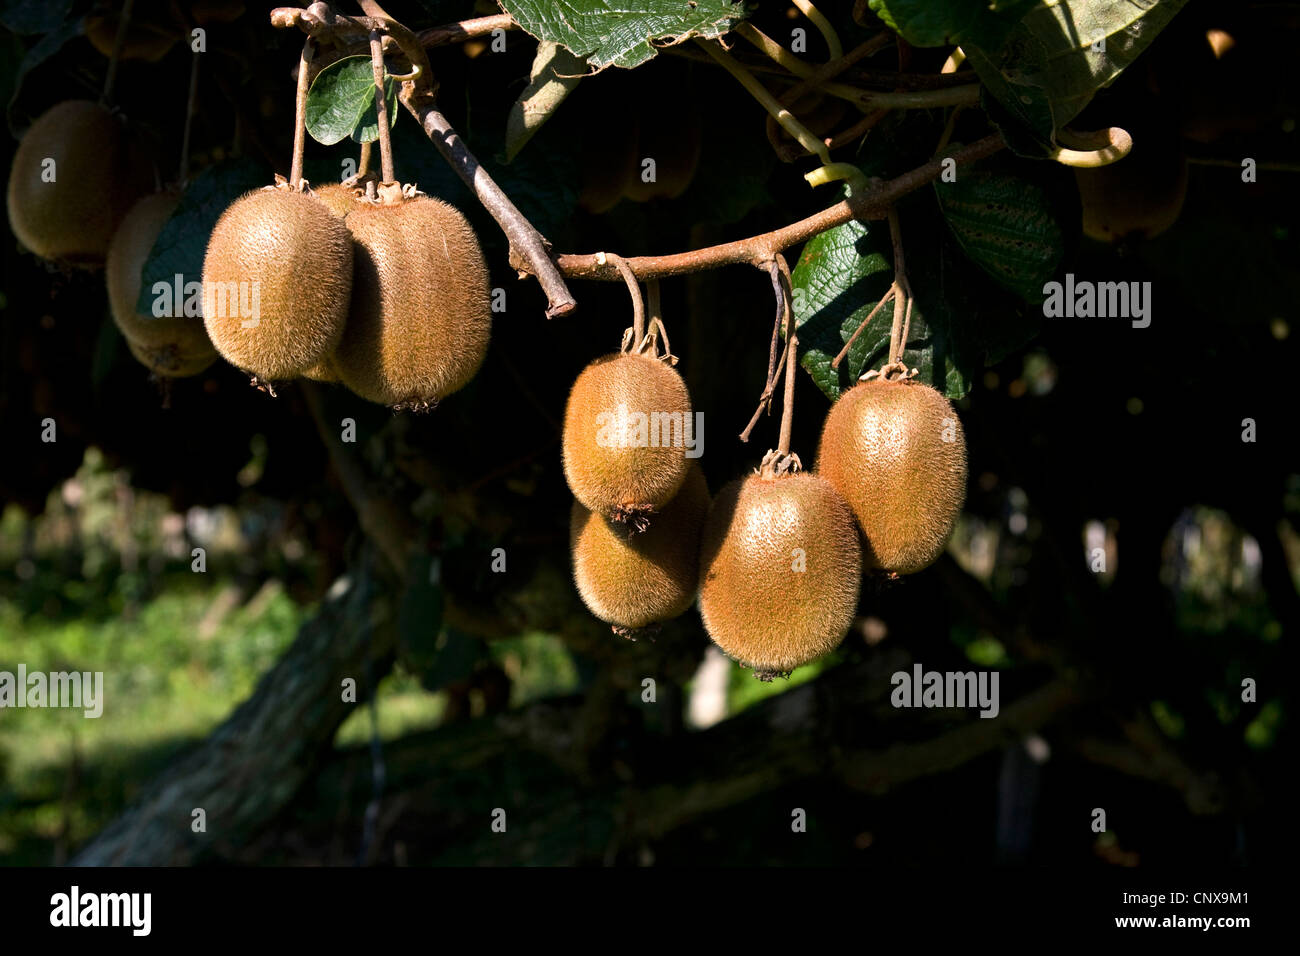 kiwi fruit, Chinese gooseberry (Actinidia deliciosa), kiwi fruits on a branch, Greece - Stock Image